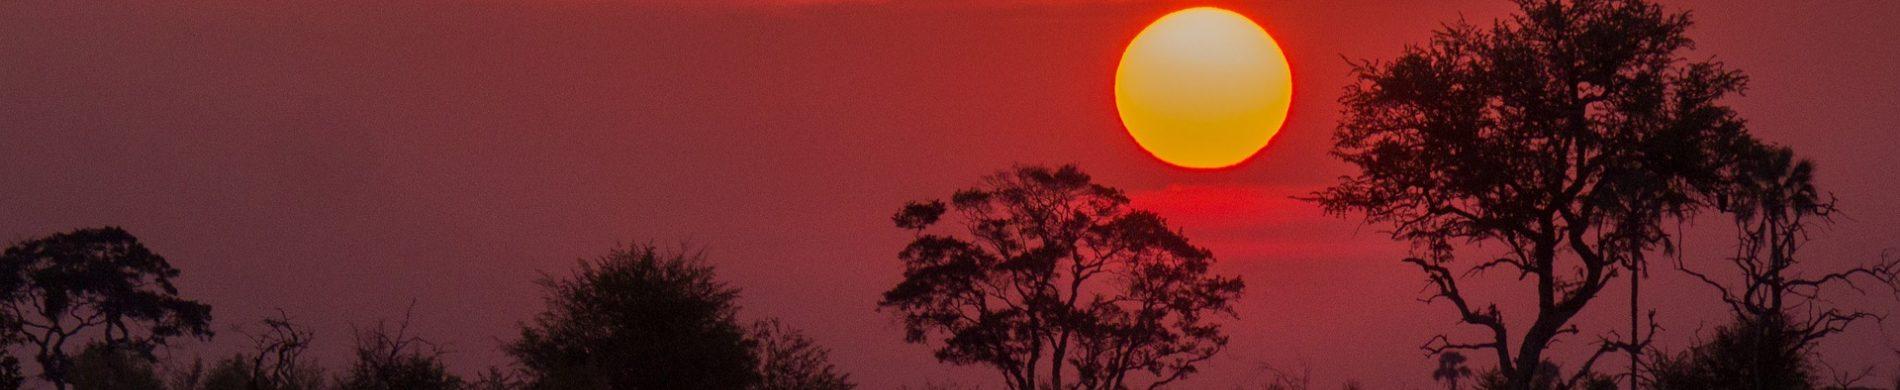 Botswana - Le grand Botswana - Les matins du monde